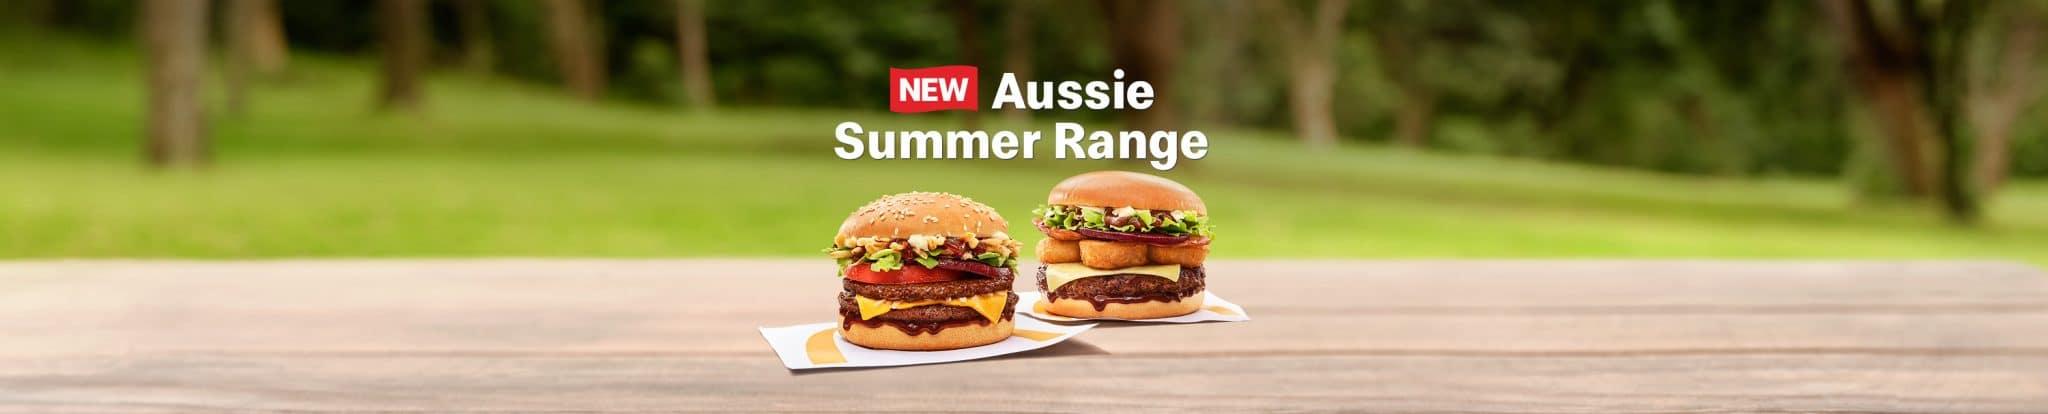 McDonald's Aussie Angus